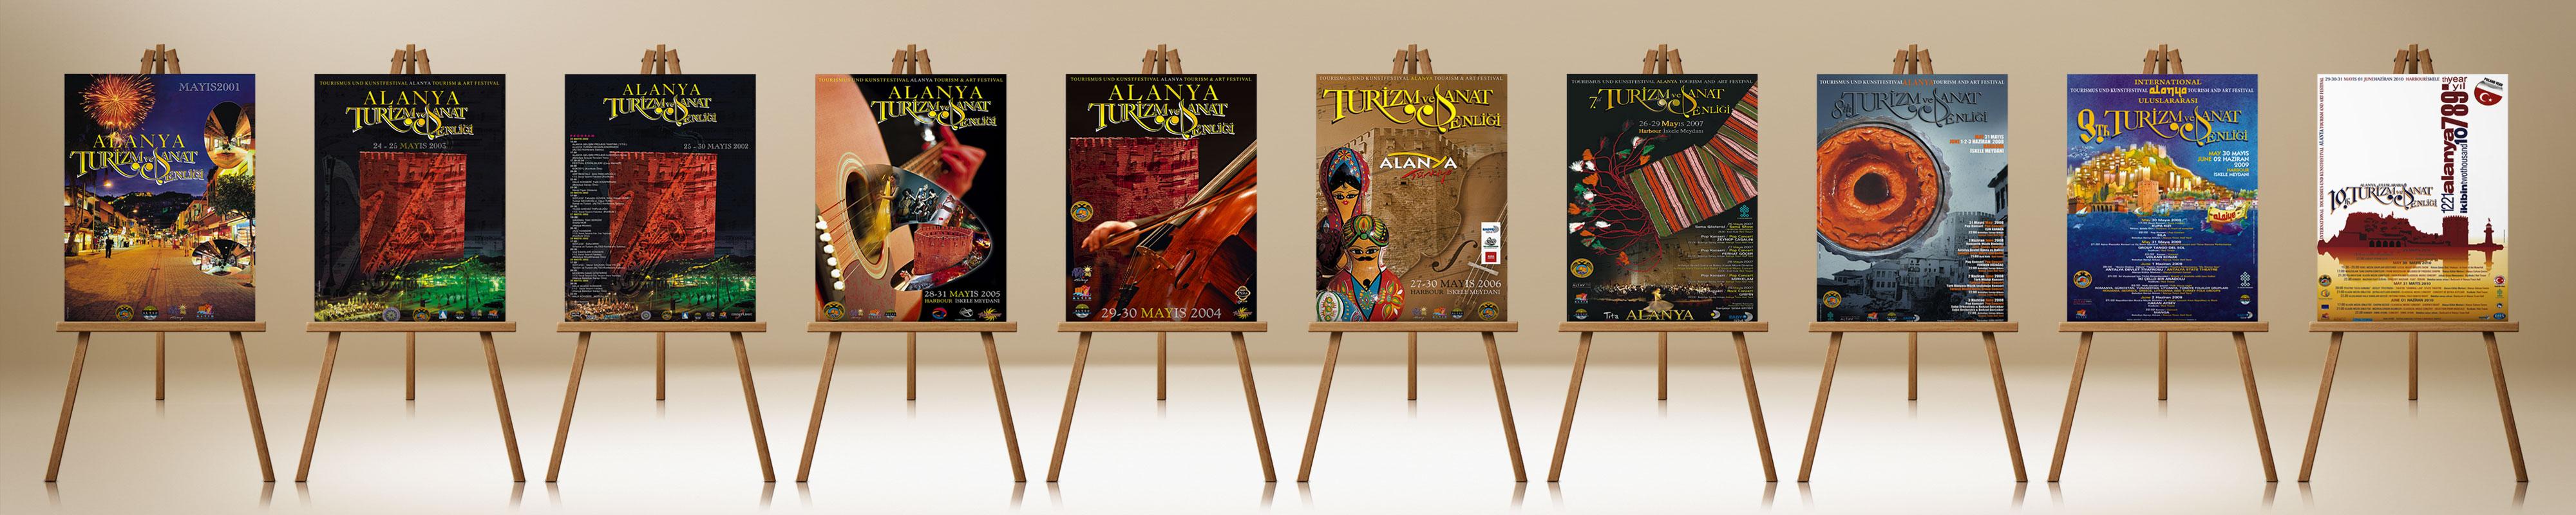 Festival Afişi Sergisi - Alanya Turizm Sanat Şenliği